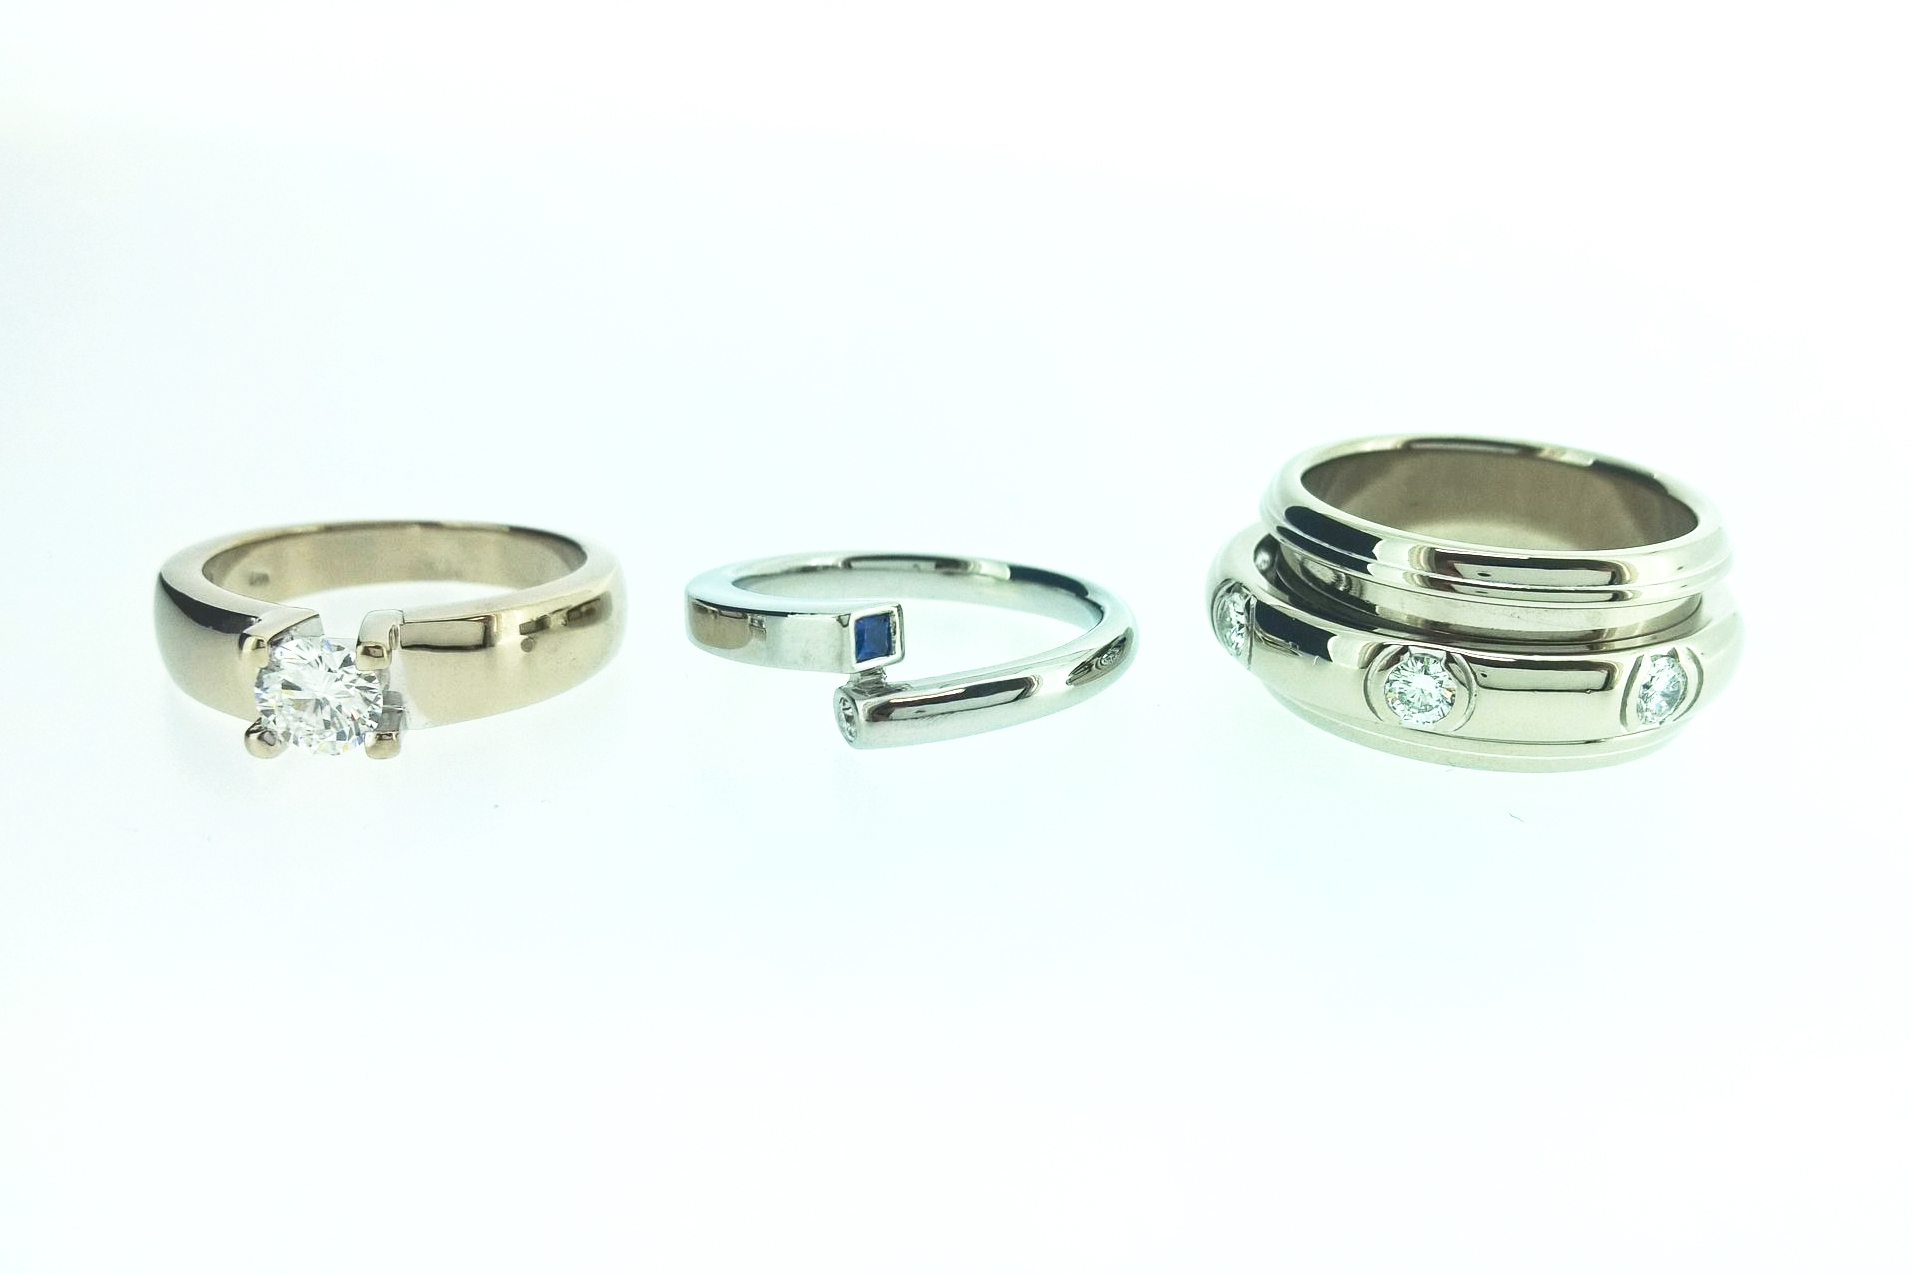 Afbeelding 2  Linker ring 18kt witgoud, midden ring Argen 19kt witgoud, rechter ring 18kt palladium witgoud.